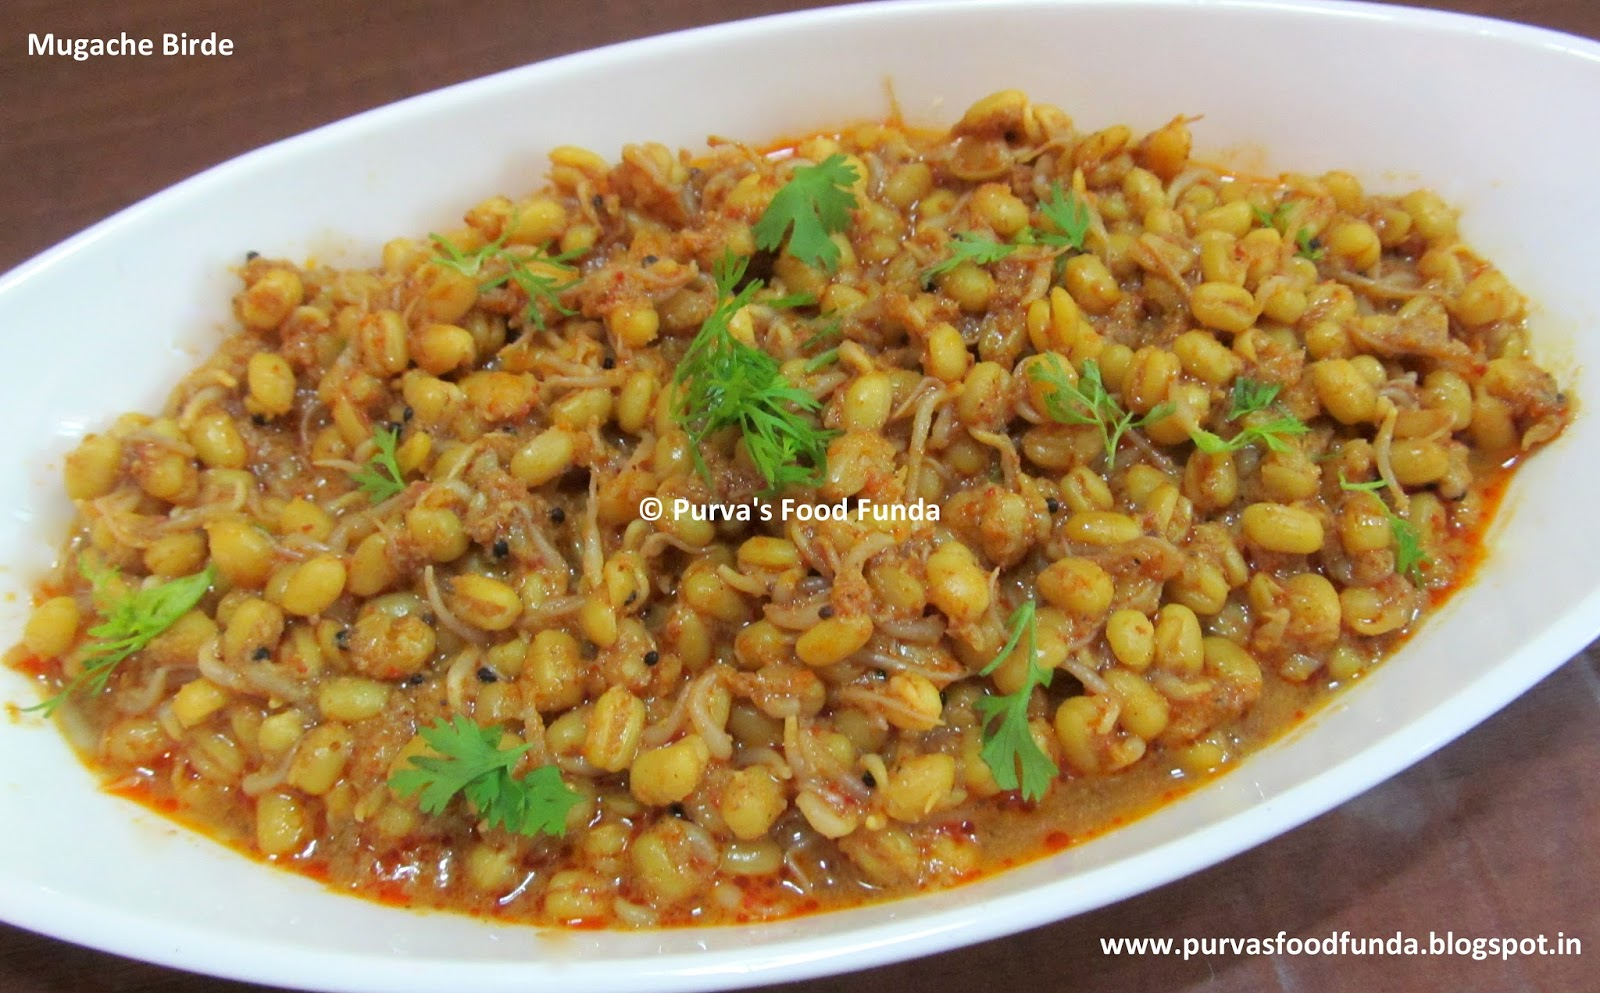 Food funda mugache birdebhirde maharashtrian style sprouted mugache birdebhirde maharashtrian style sprouted peeled moong curry forumfinder Images